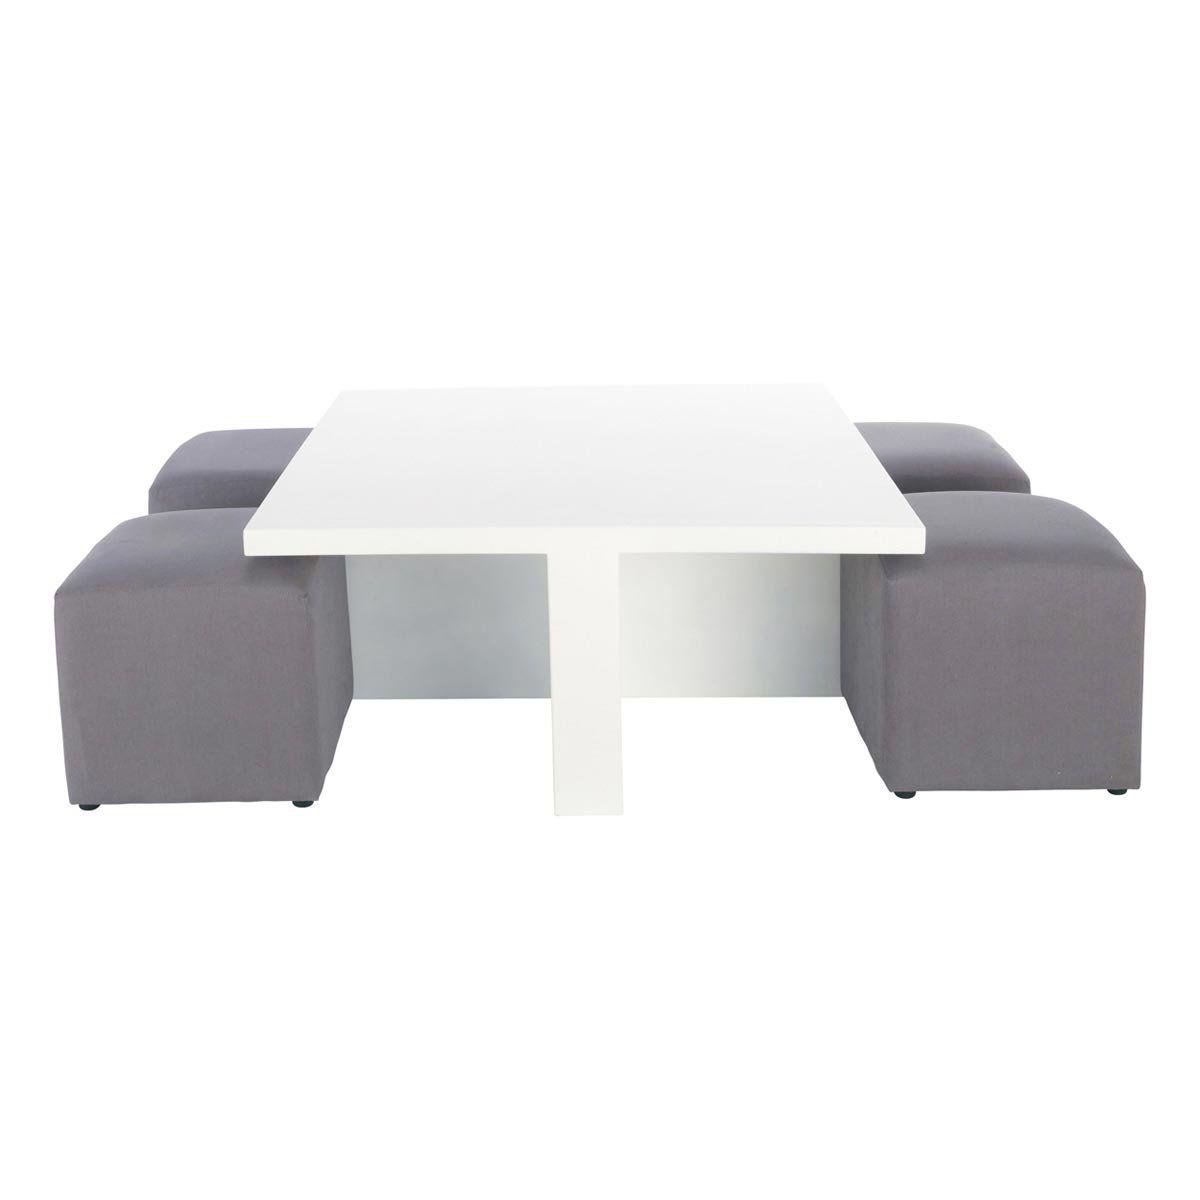 Table basse carrée blanche et 4 tabourets Cubik | Home sweet home ...